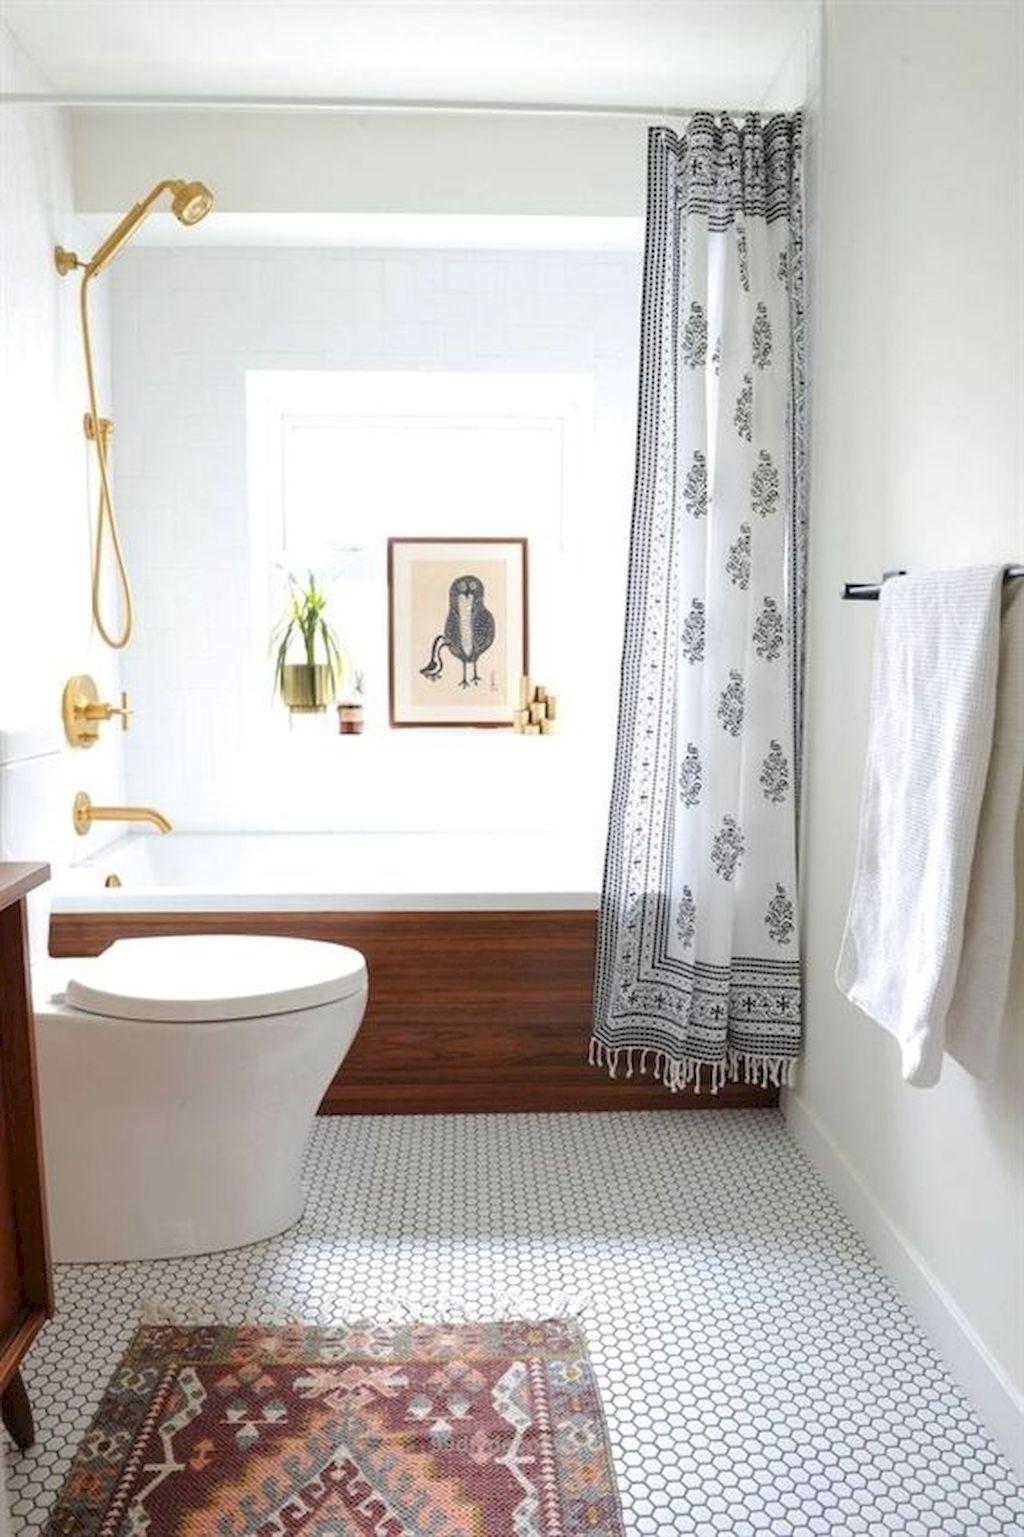 tiles ideas for small bathroom 53 bathroom remodel on amazing small bathroom designs and ideas id=89214